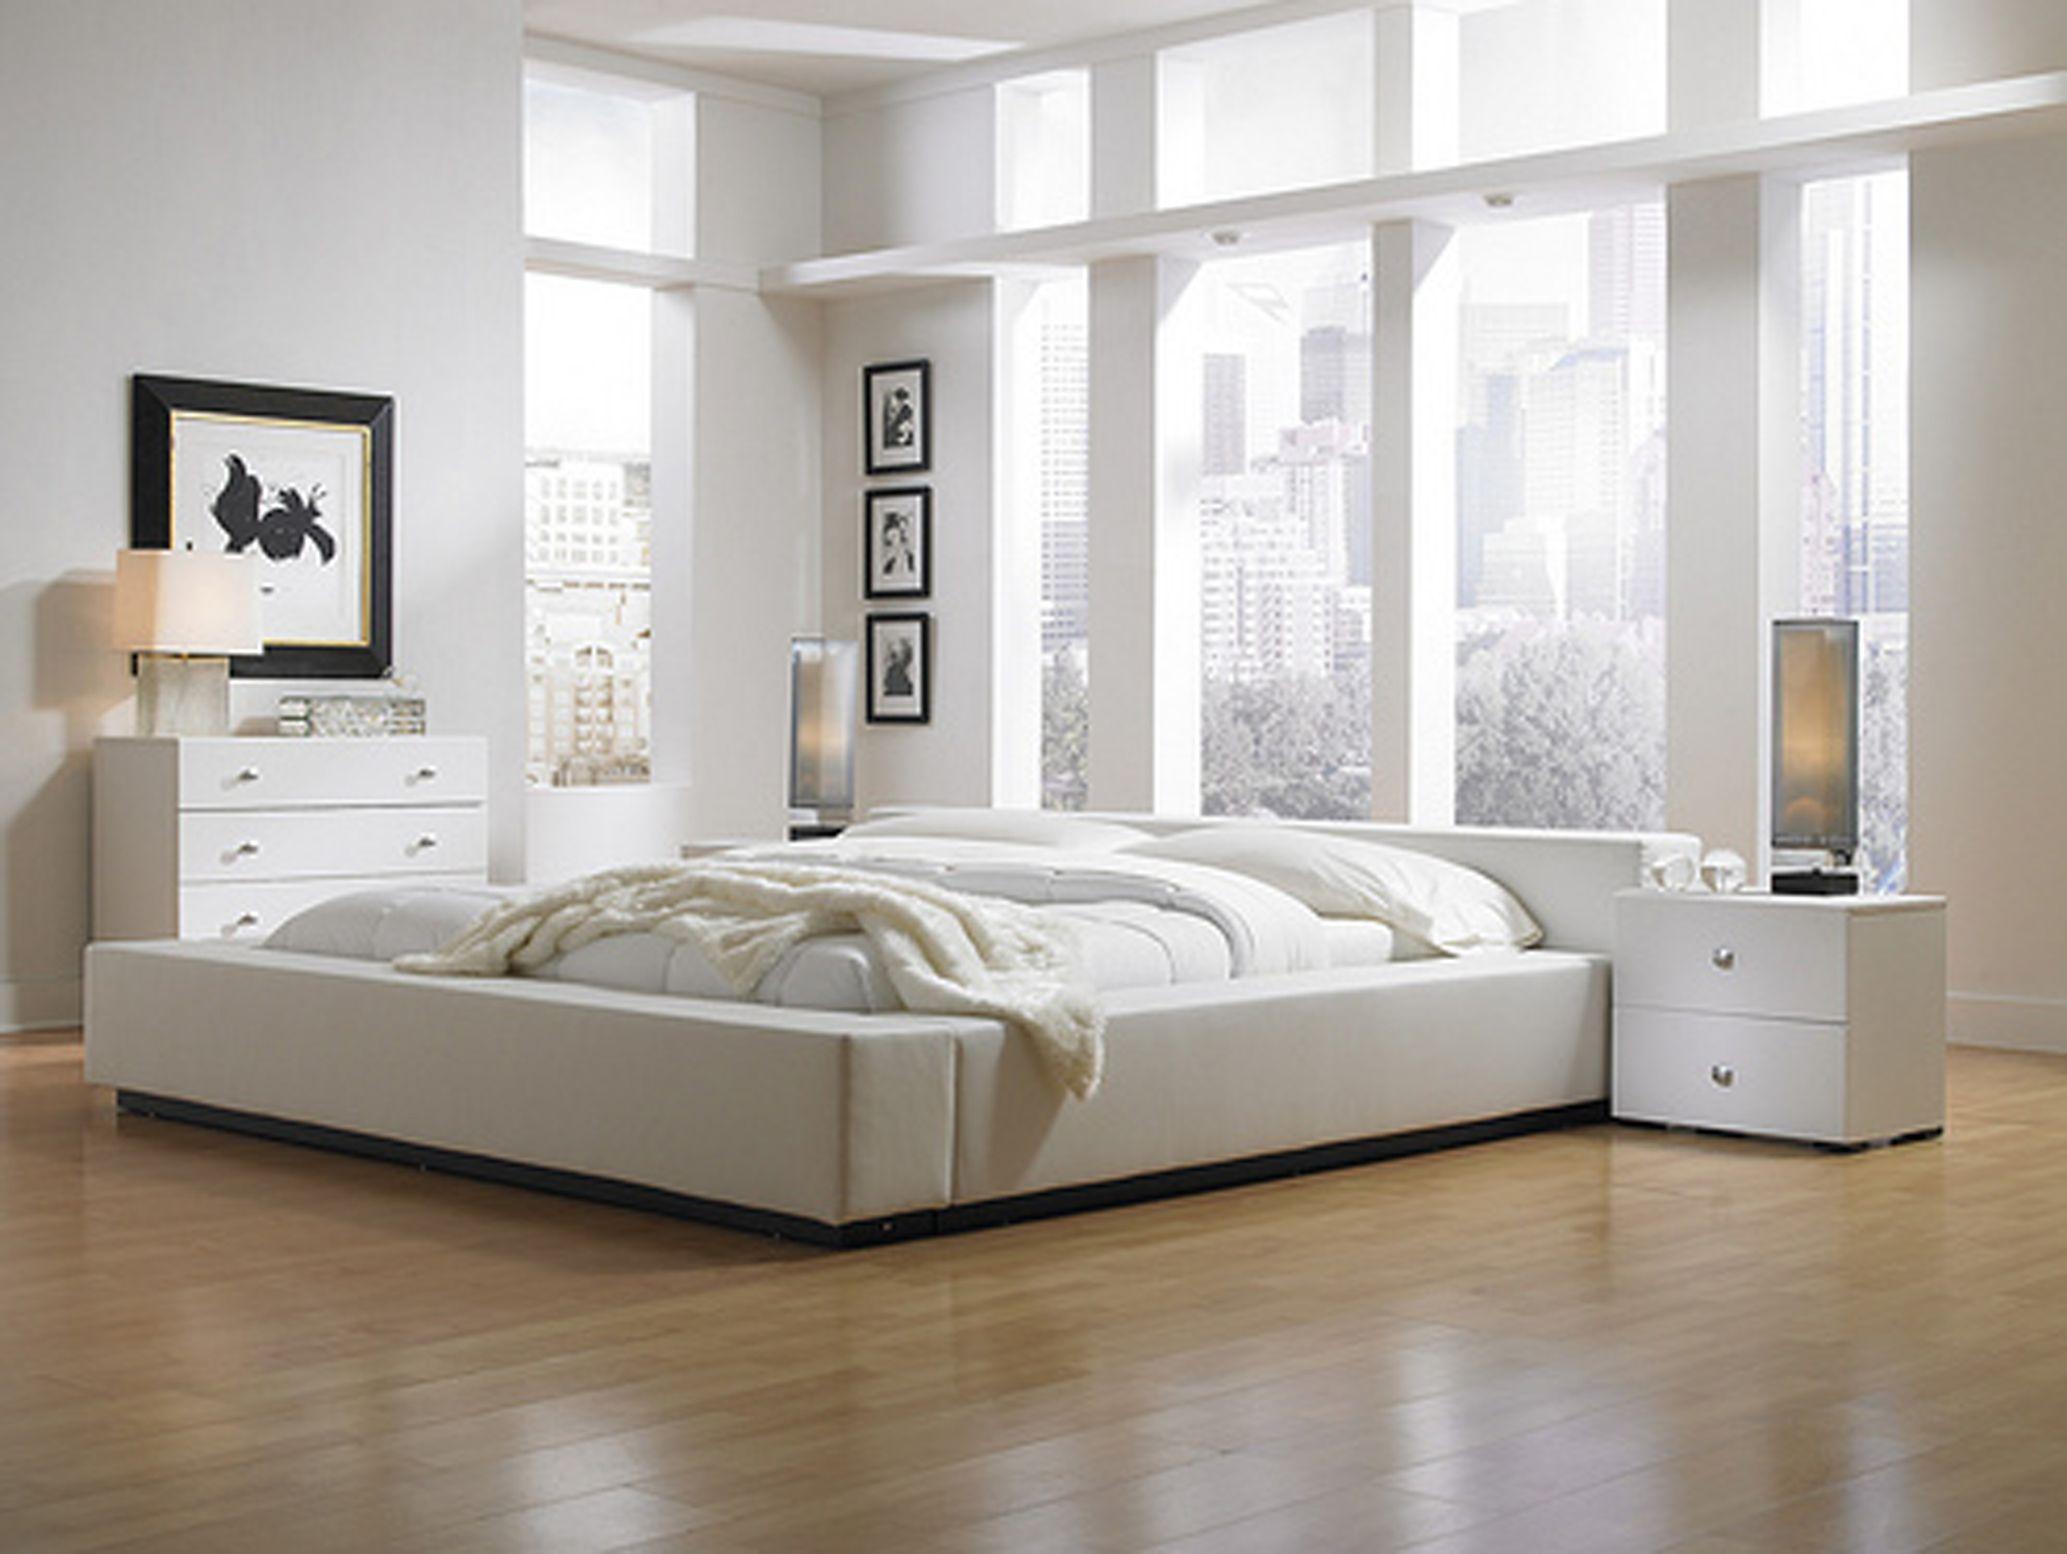 Most Popular Bedroom Sets Design Room Nice design quotes House